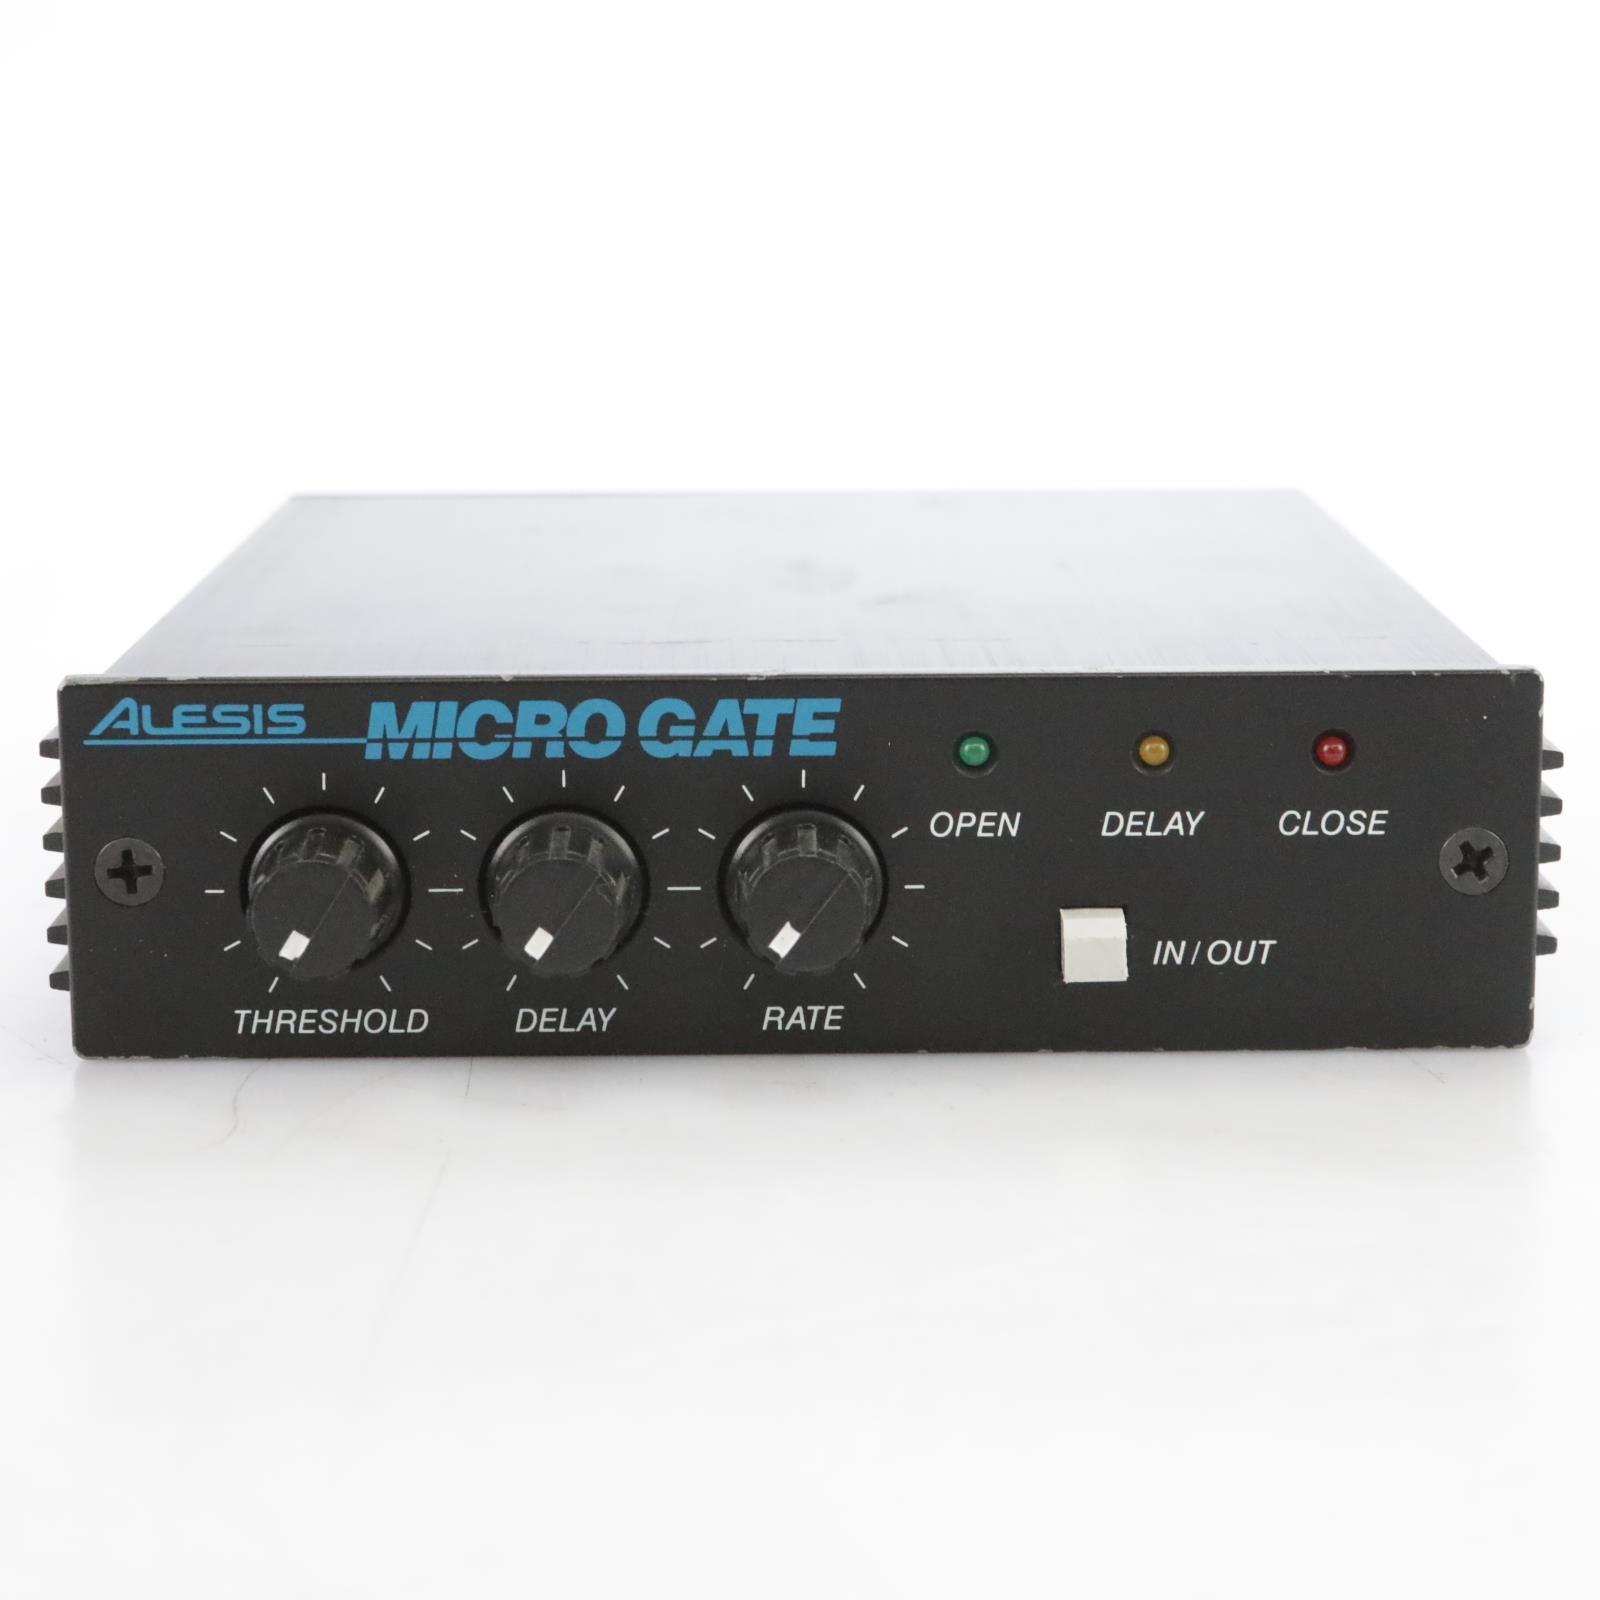 Alesis Microgate Stereo Gate Expander #43661